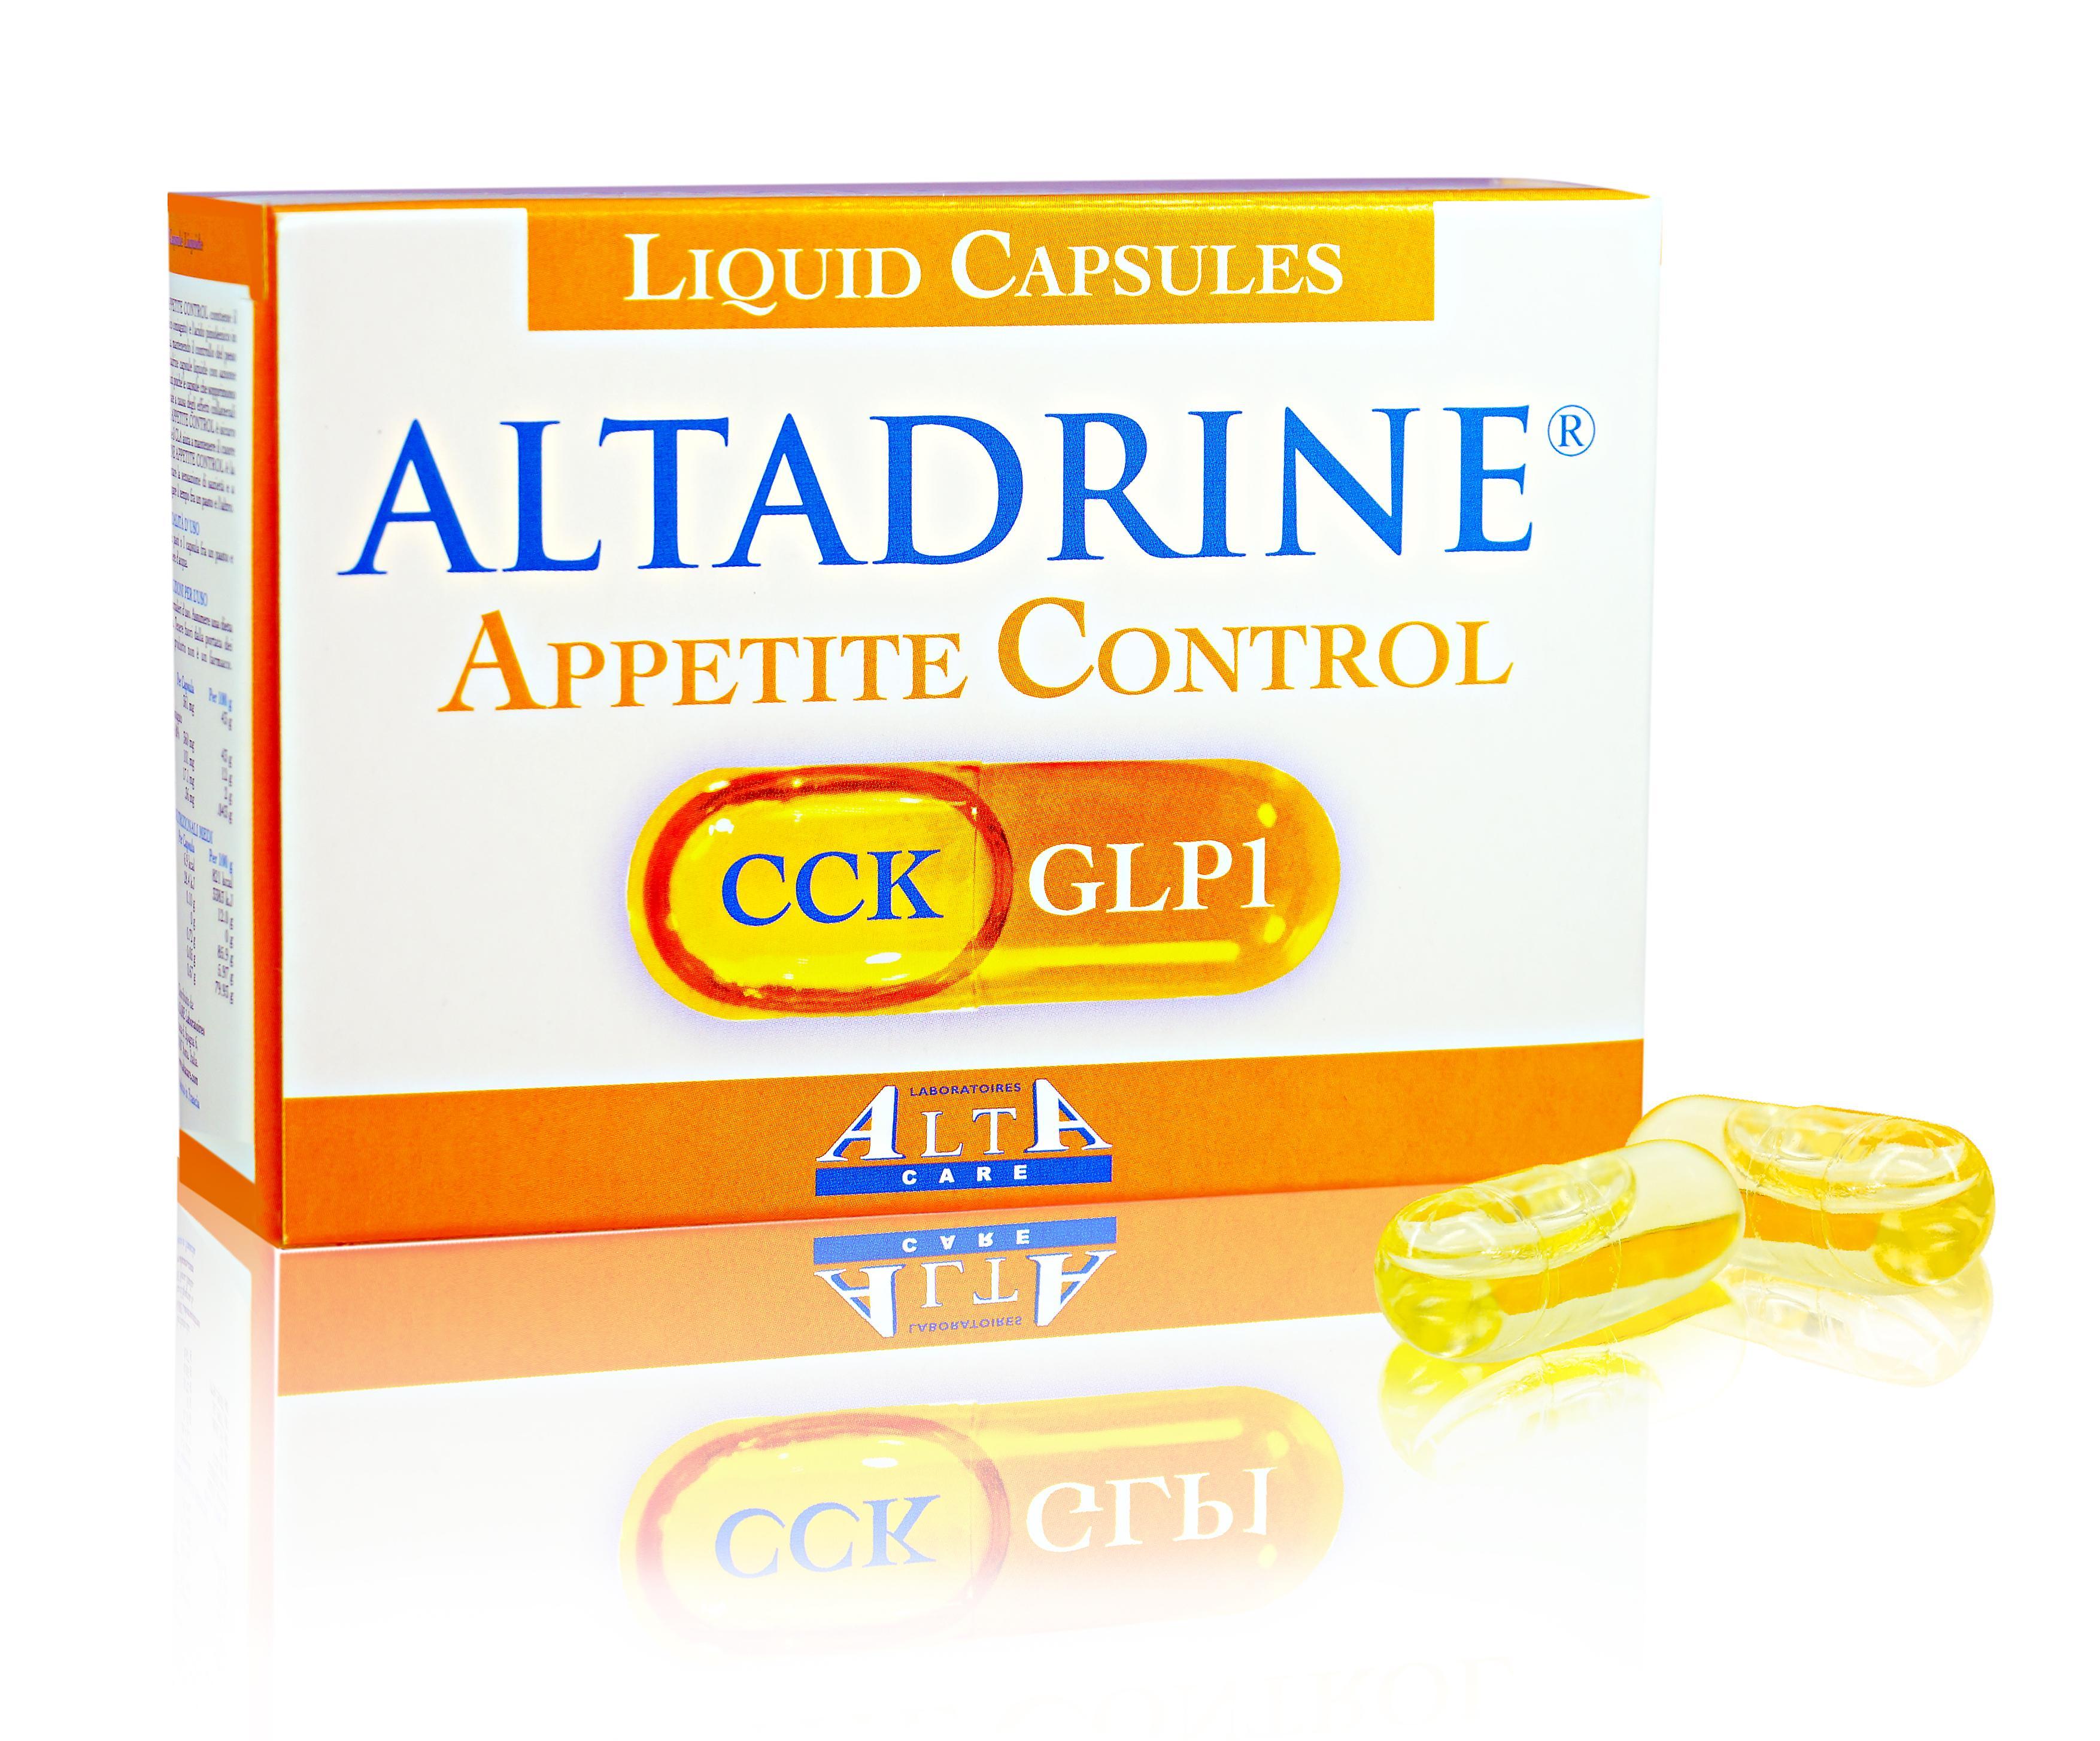 Altadrine Appetite Control